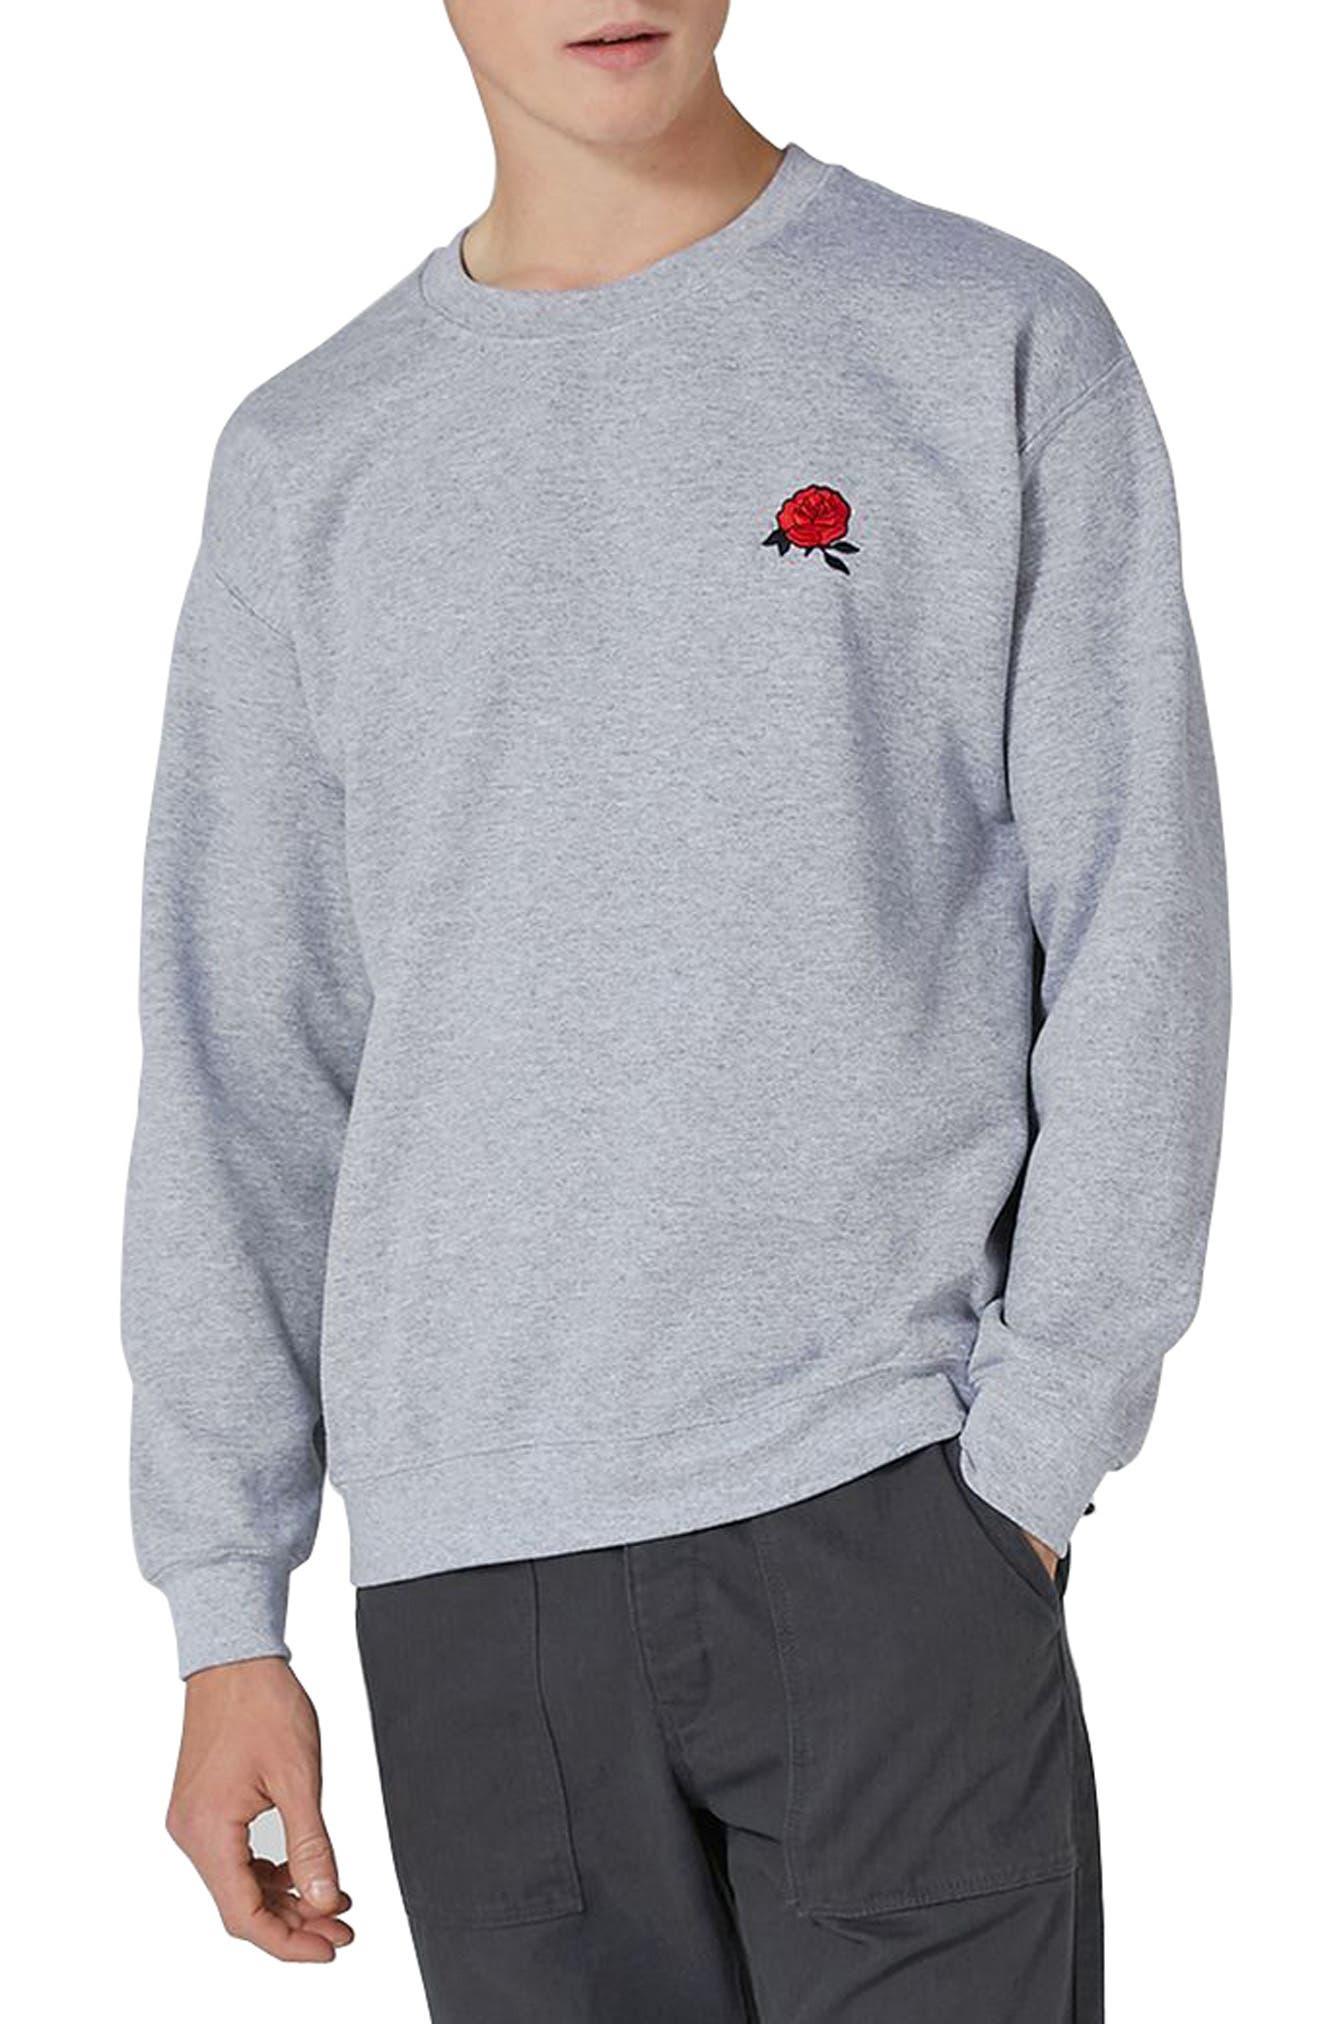 Rose Embroidered Sweatshirt,                             Main thumbnail 1, color,                             050